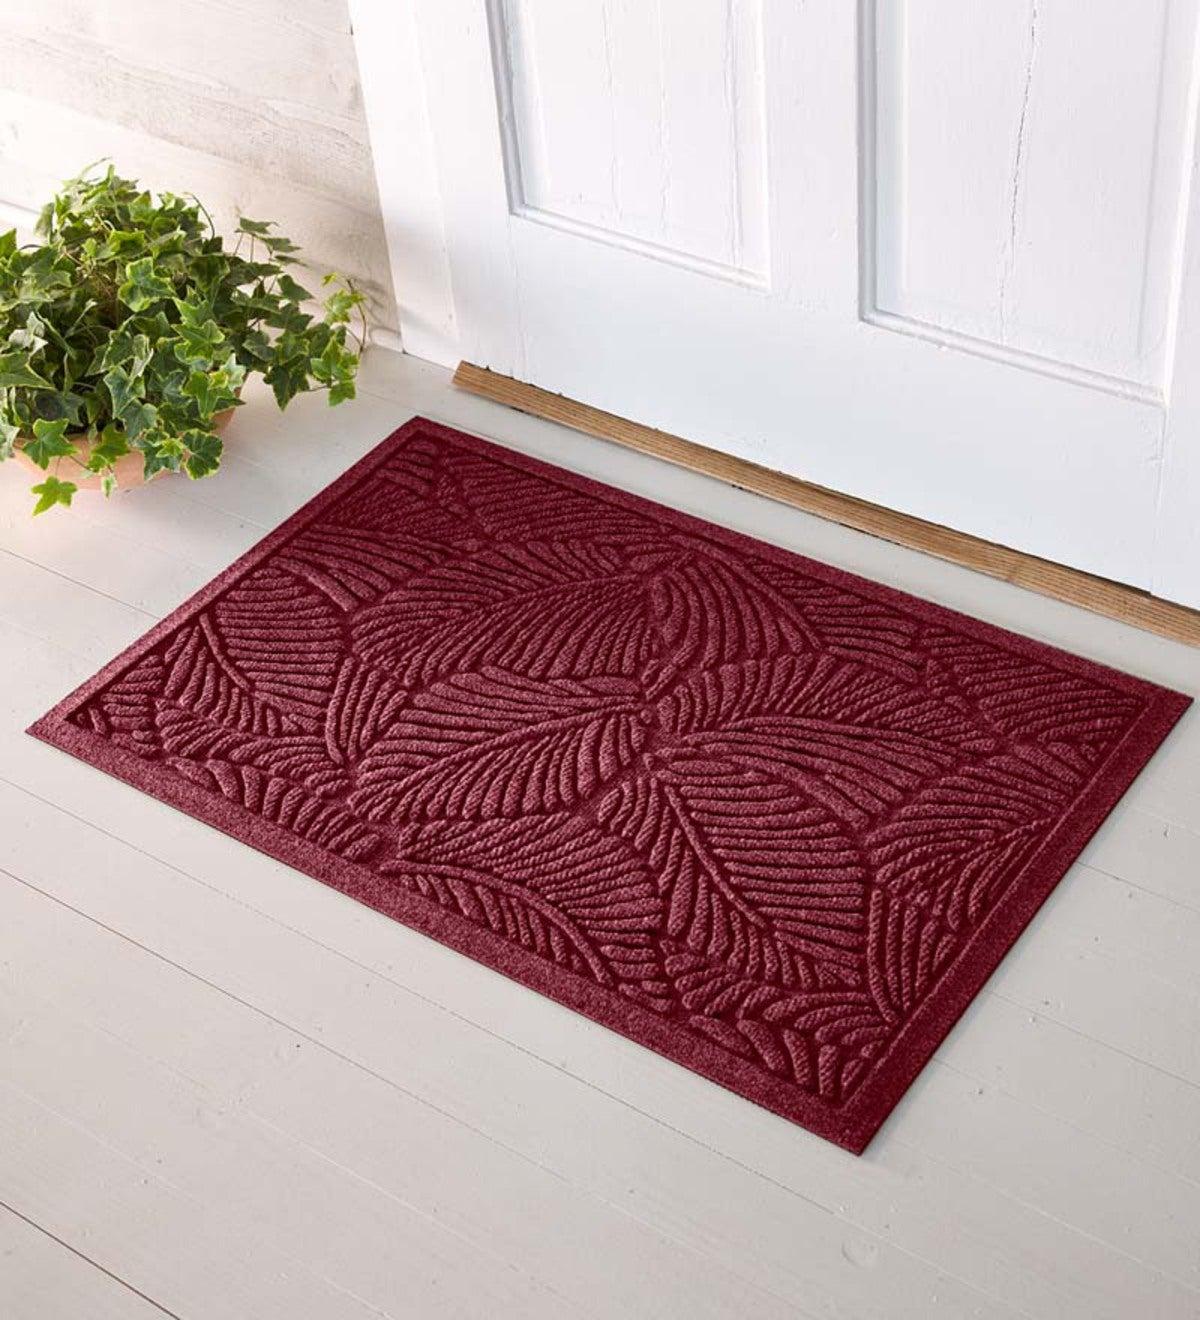 Oversized fern waterhog doormat